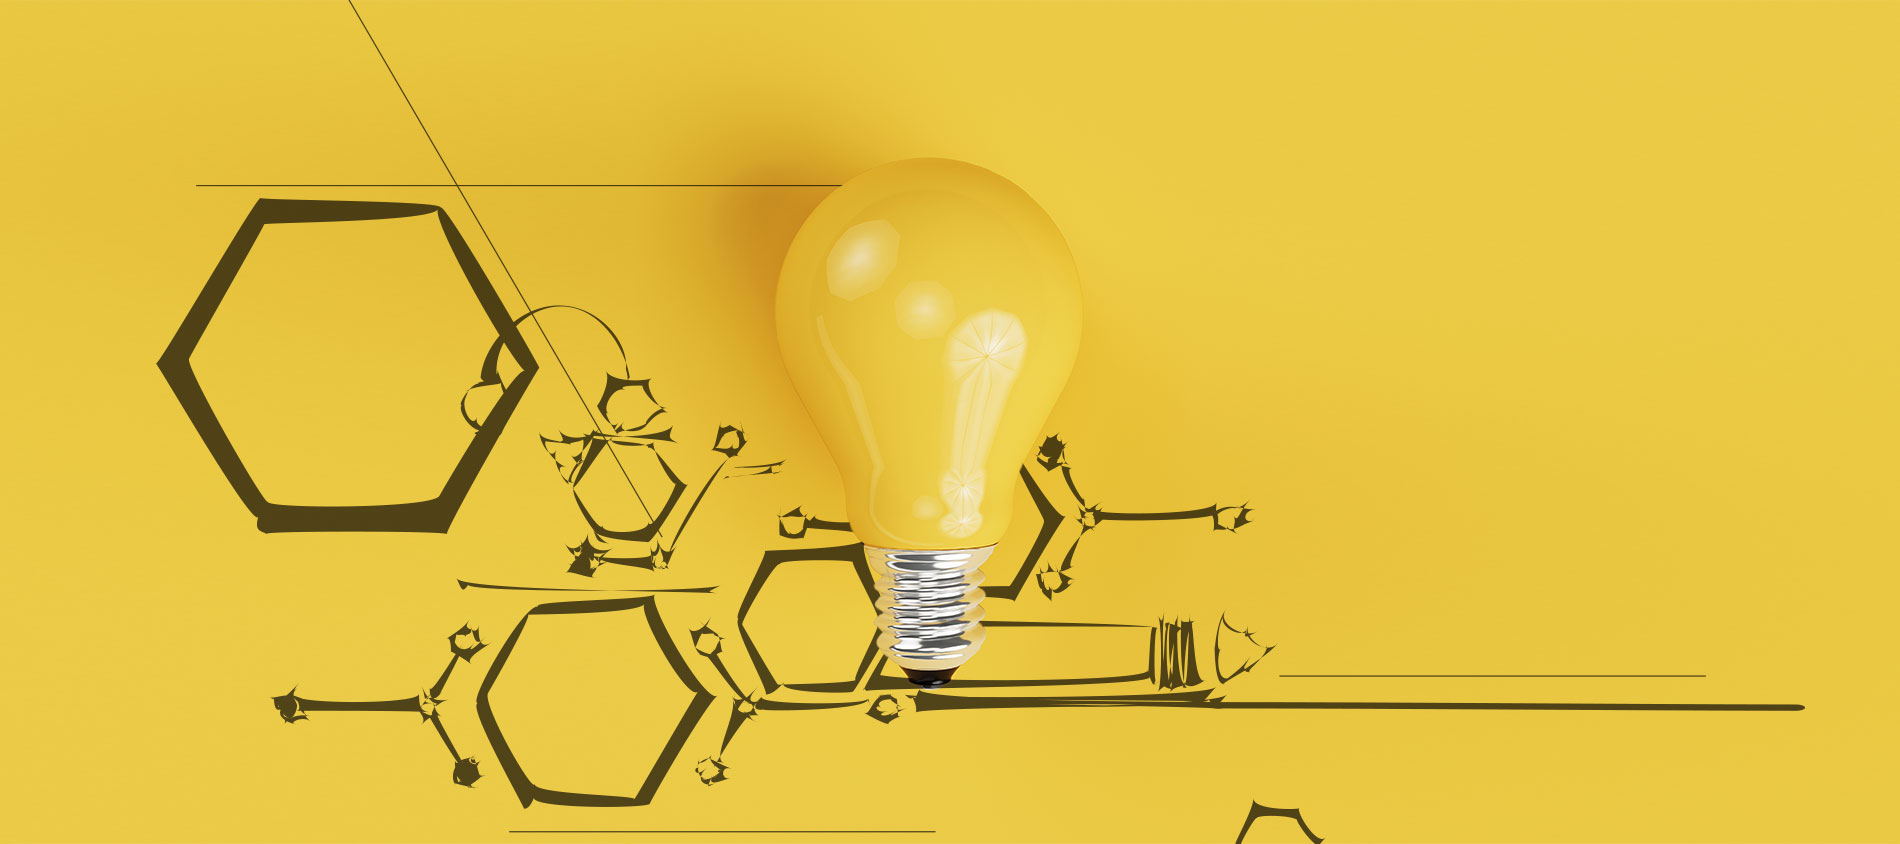 Vender ideas a través de plataformas digitales